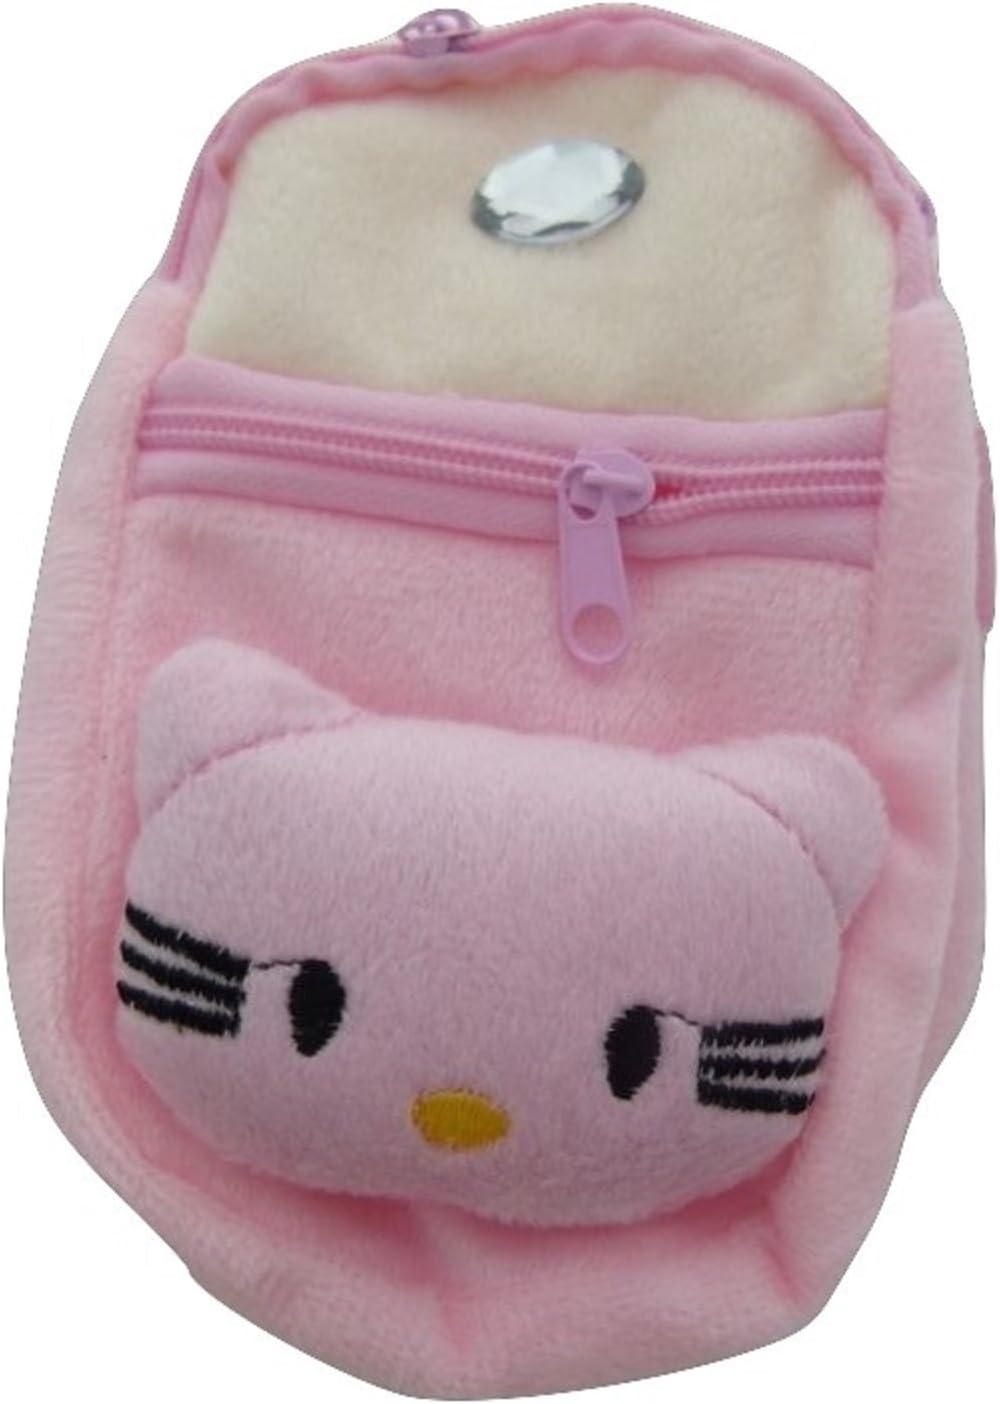 PartyErasers Kawaii Zipper Pouches Cute Animal Face Design Pink